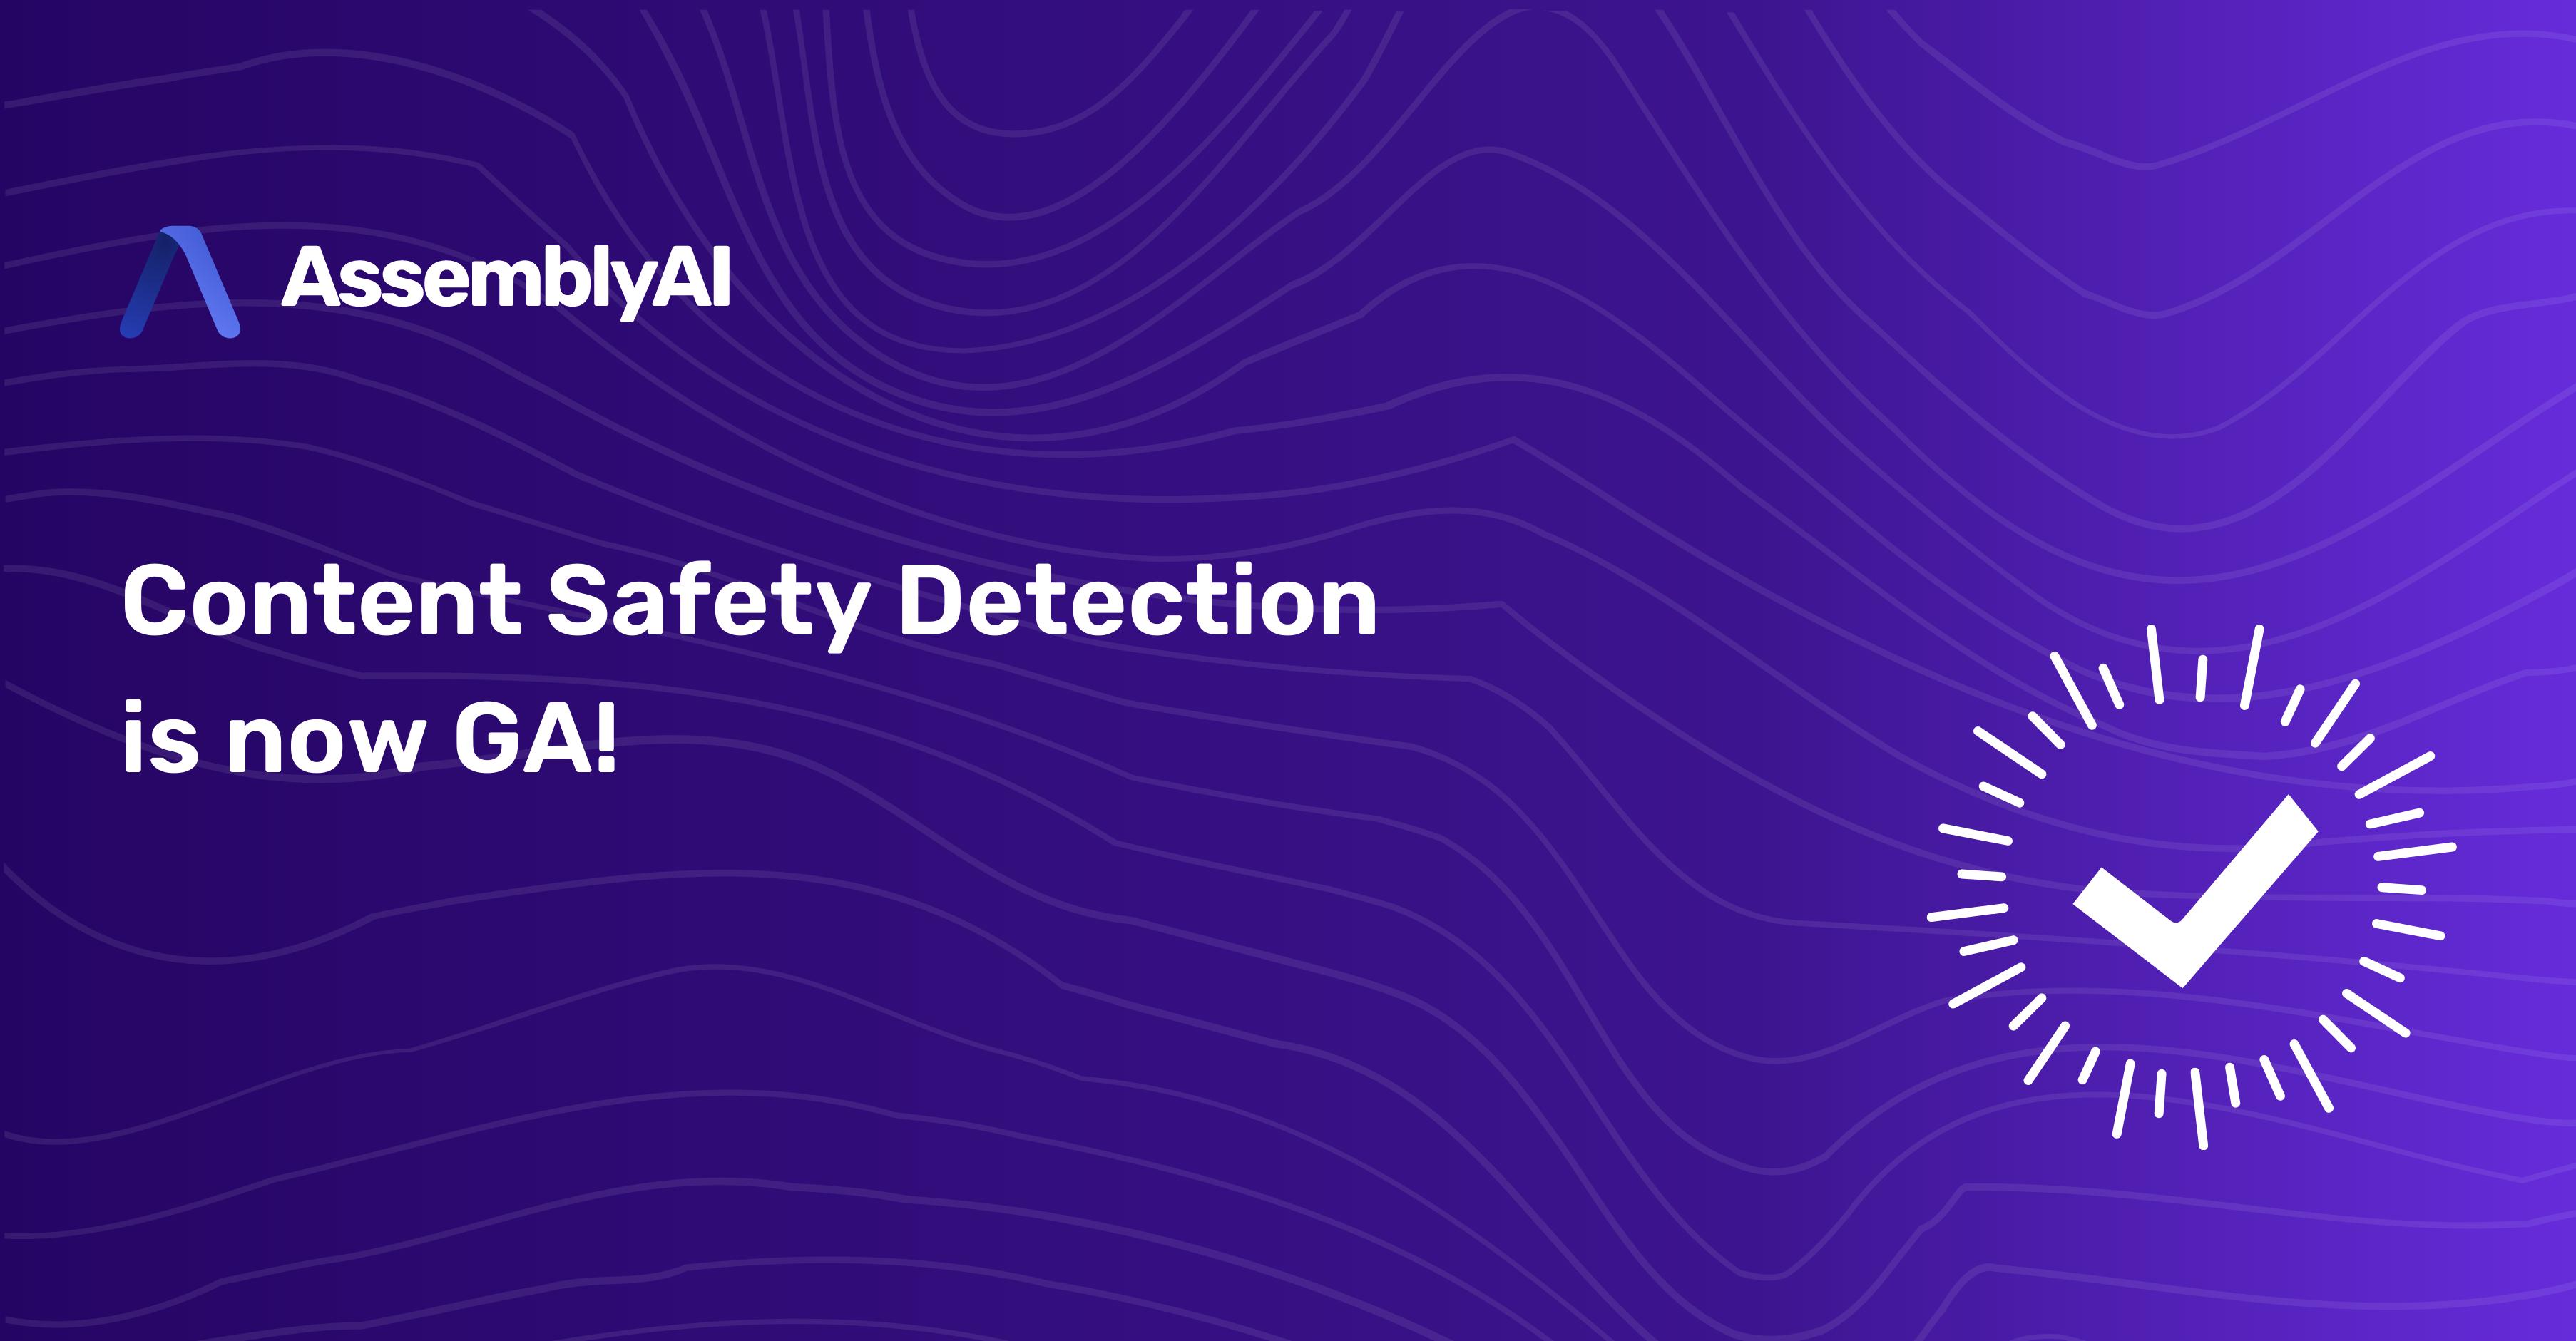 Feature Announcement: Content Safety Detection